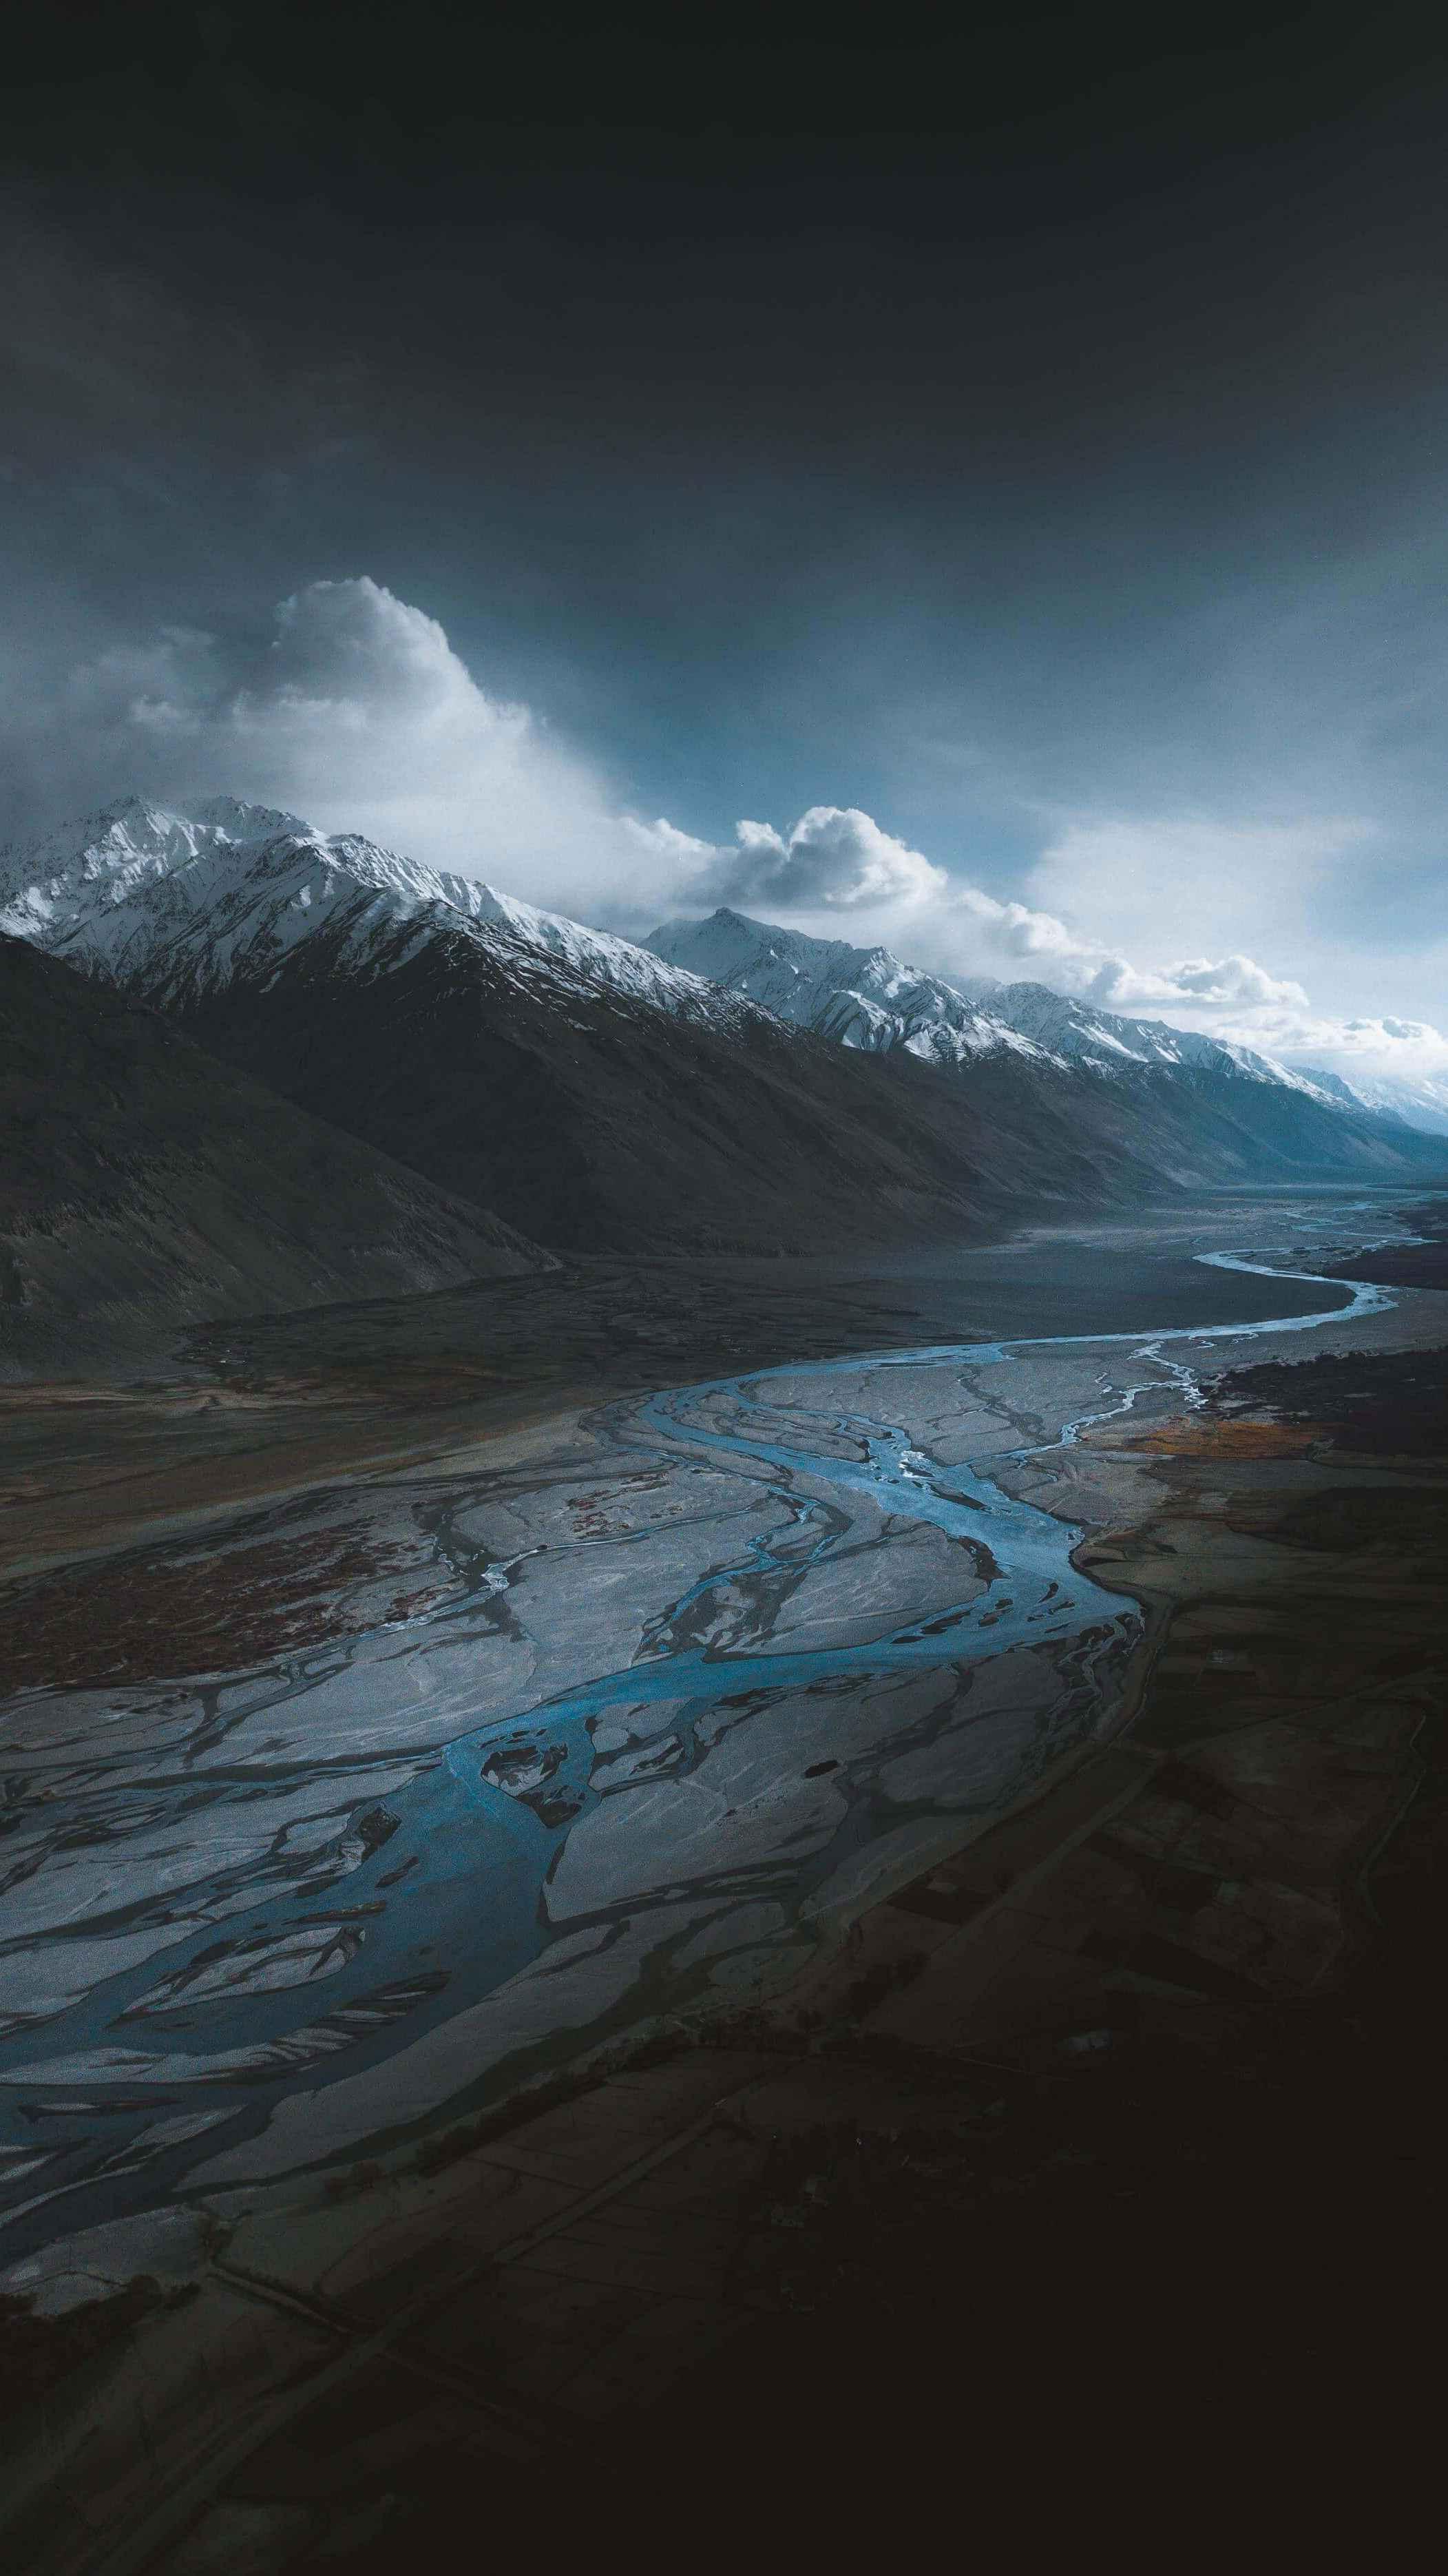 Amazing Nature Mountains Lake iPhone Wallpaper